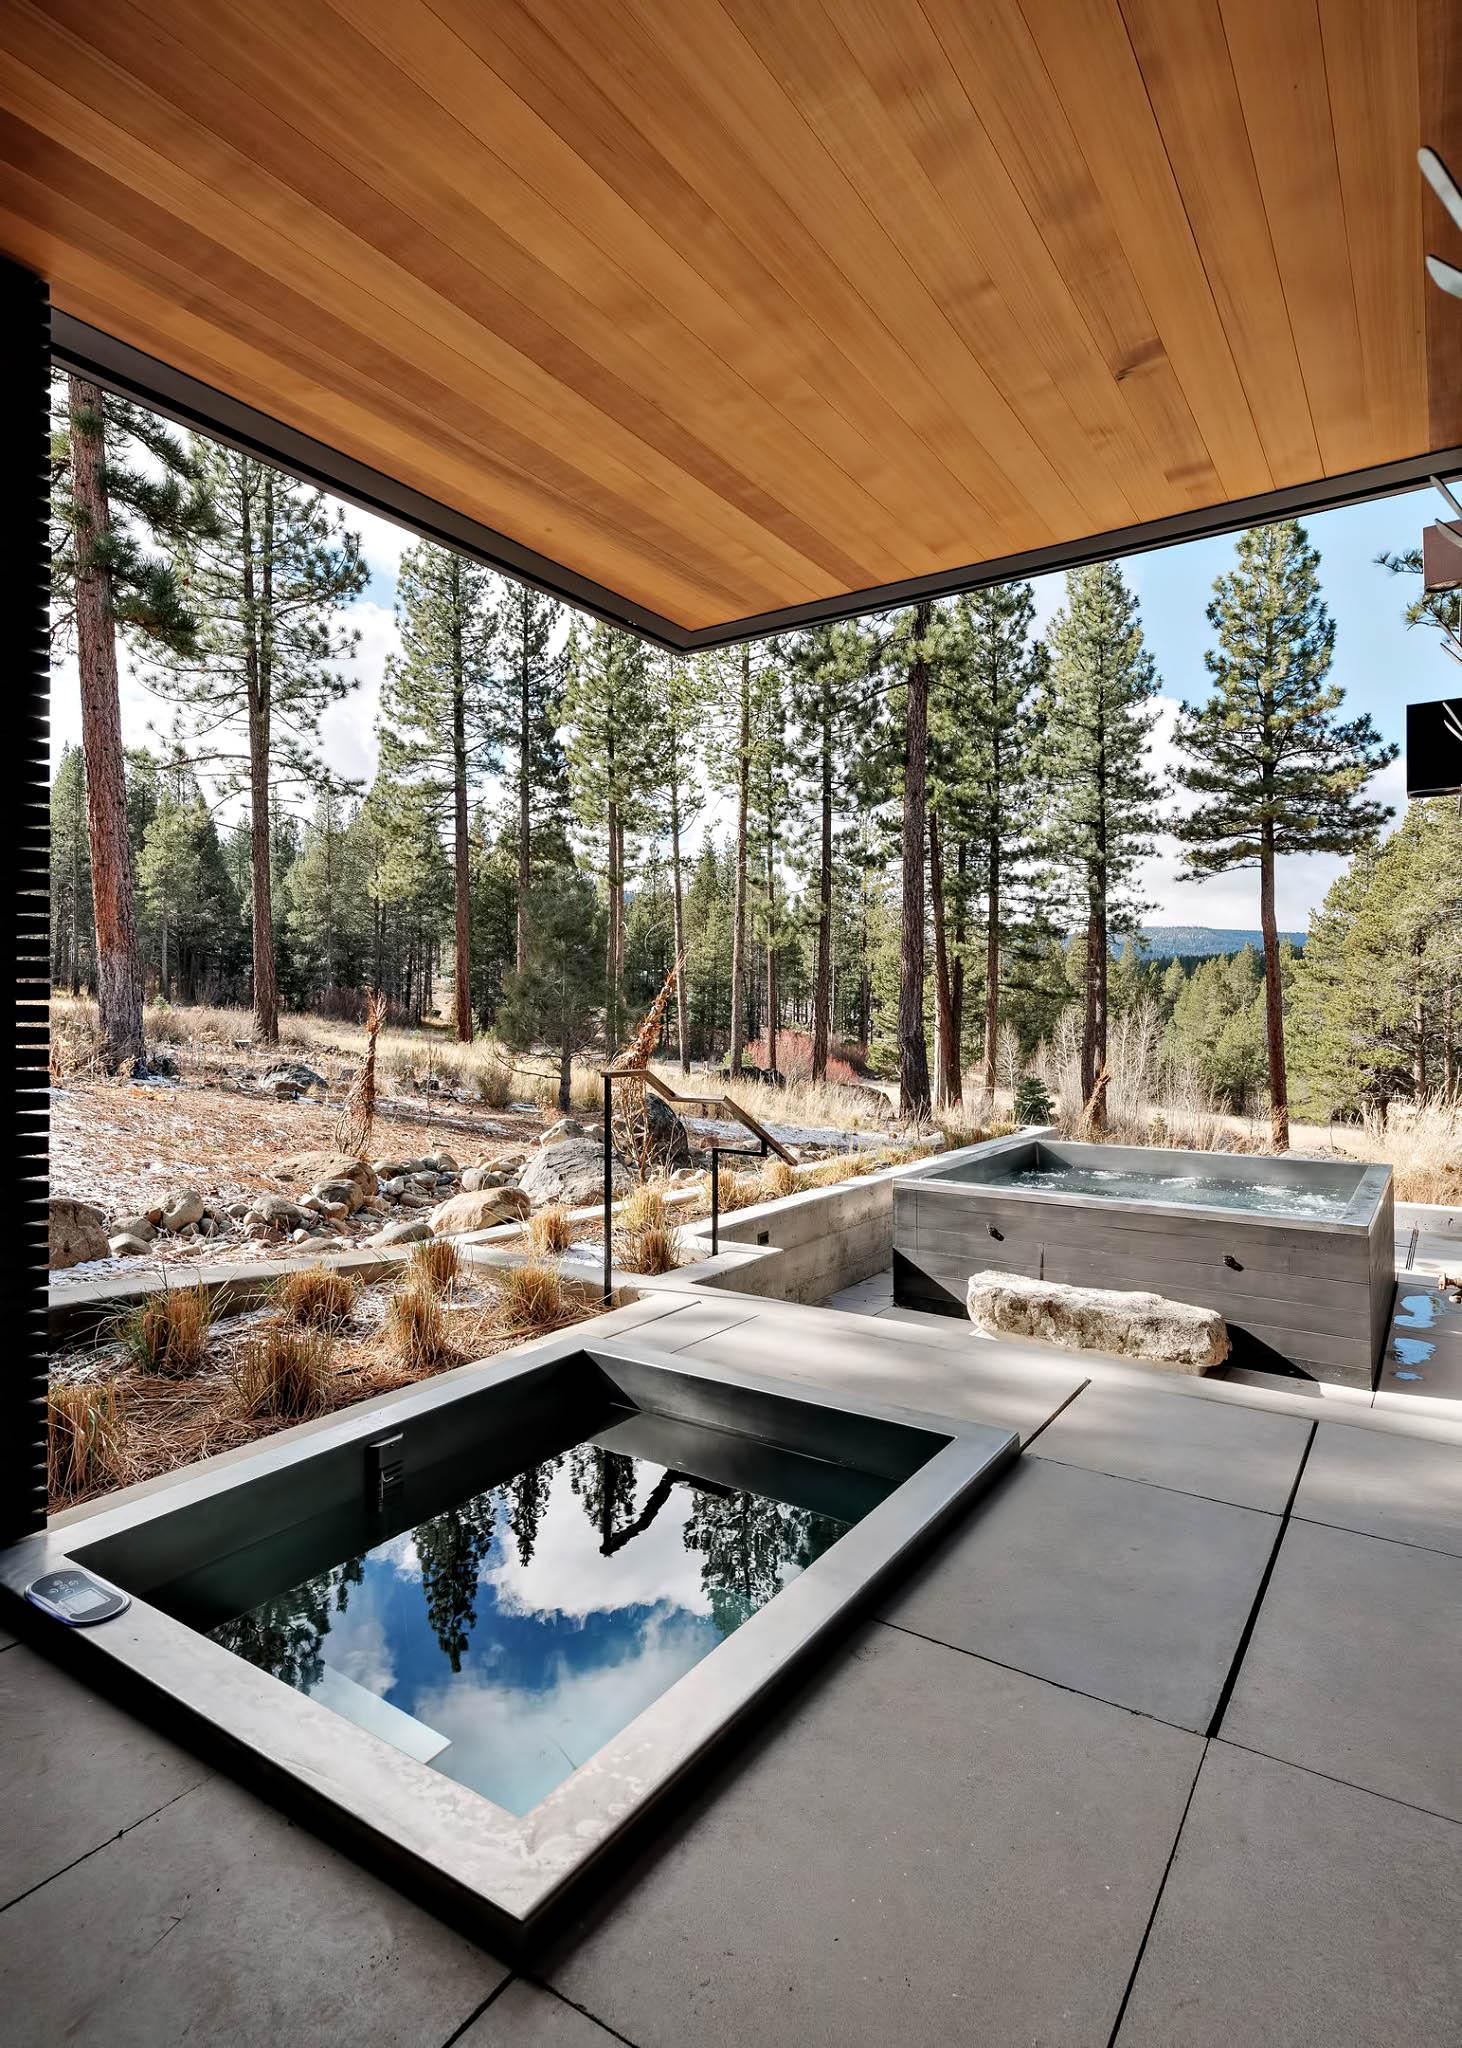 Martis Camp 479 Luxury Residence – Truckee, CA, USA